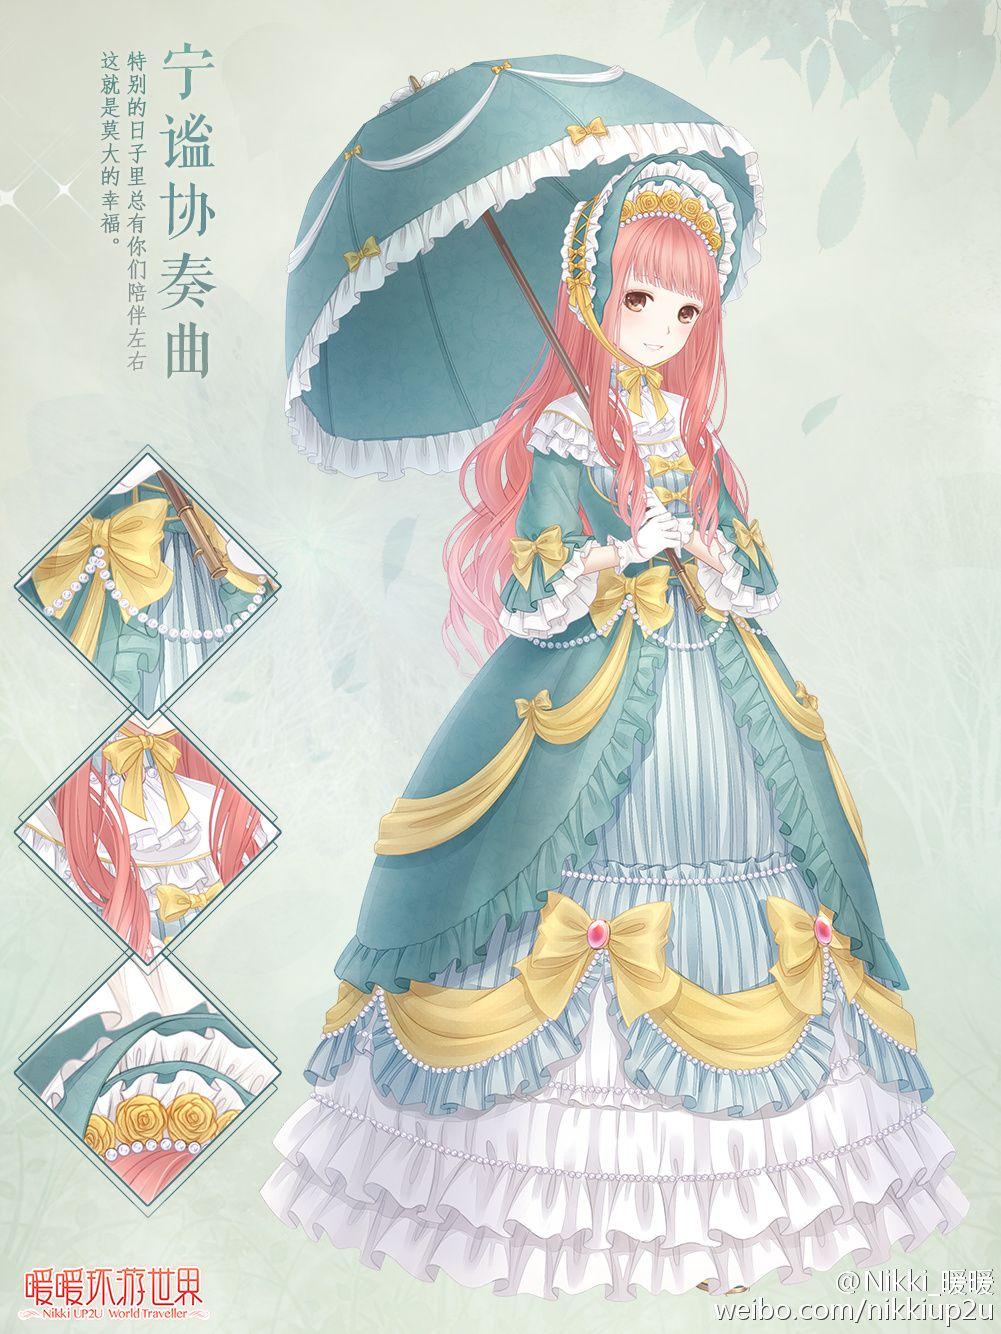 Anime girls · dress up diary · cutie elizabeth estilo anime manga anime anime art anime music ngôi sao